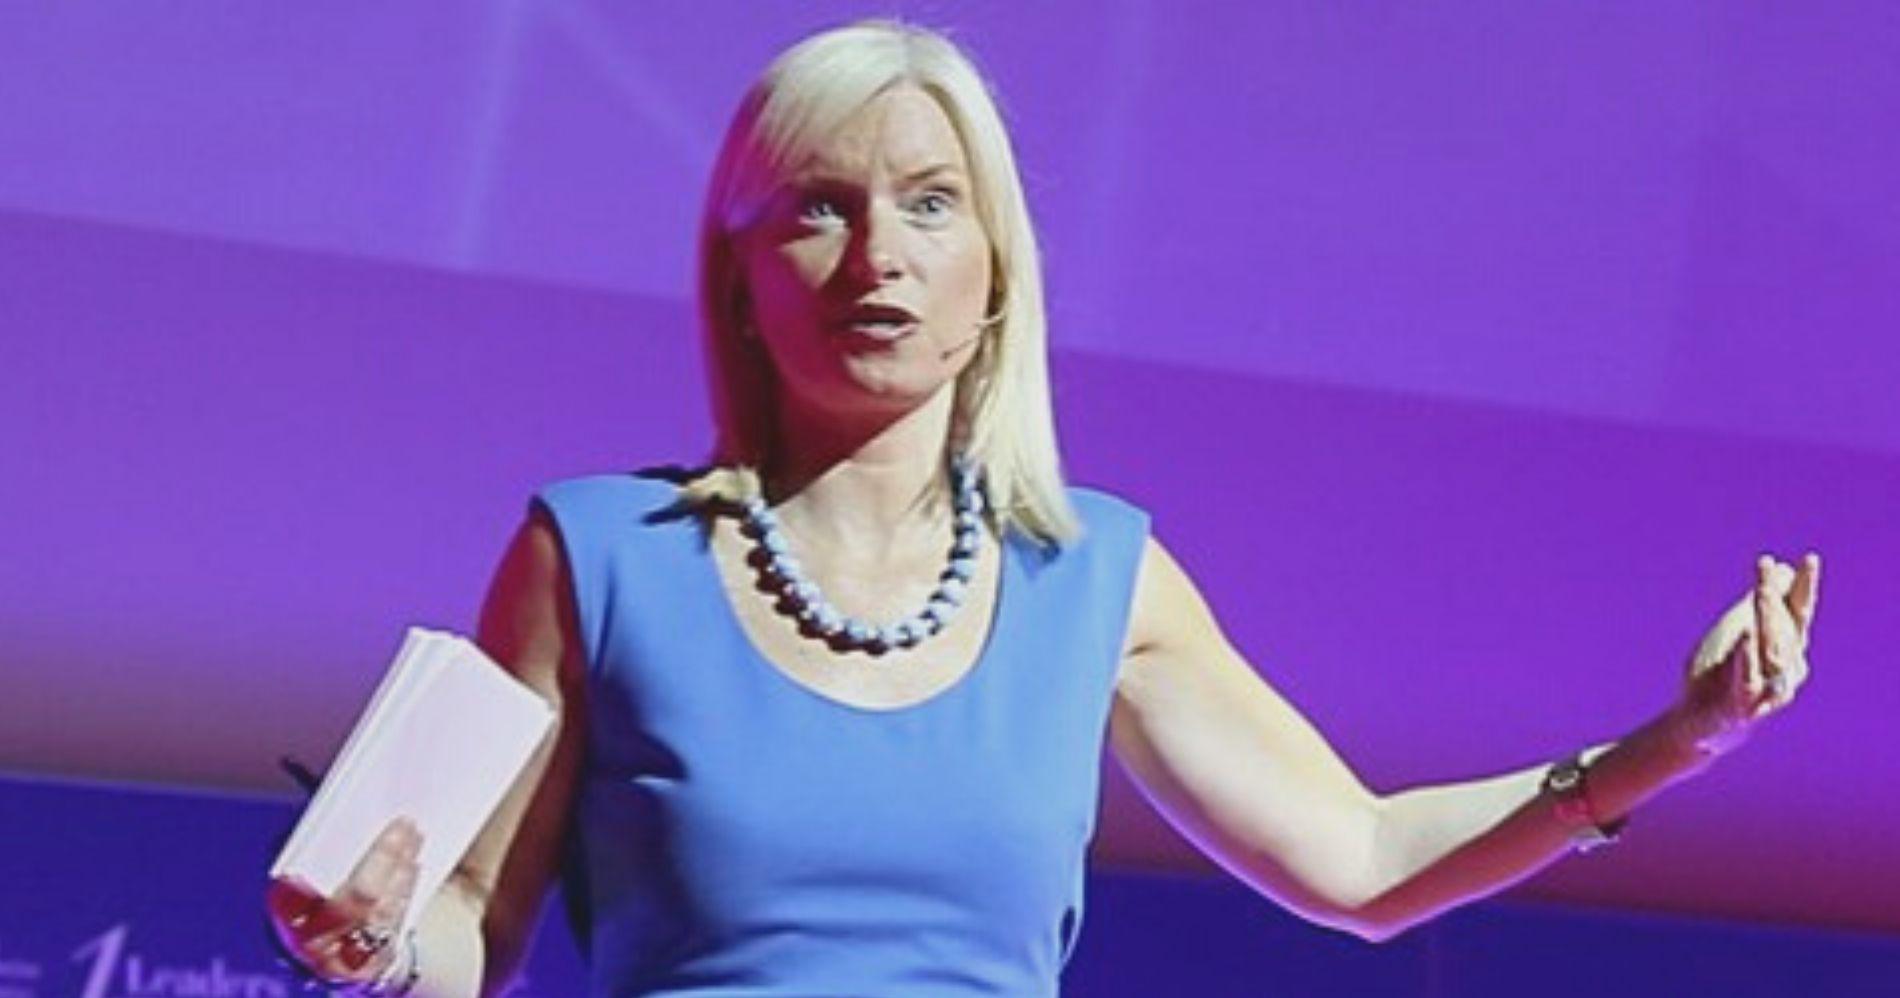 Carolyn Everson Resign dari Facebook Illustration Web Bisnis Muda - Image: Wikimedia